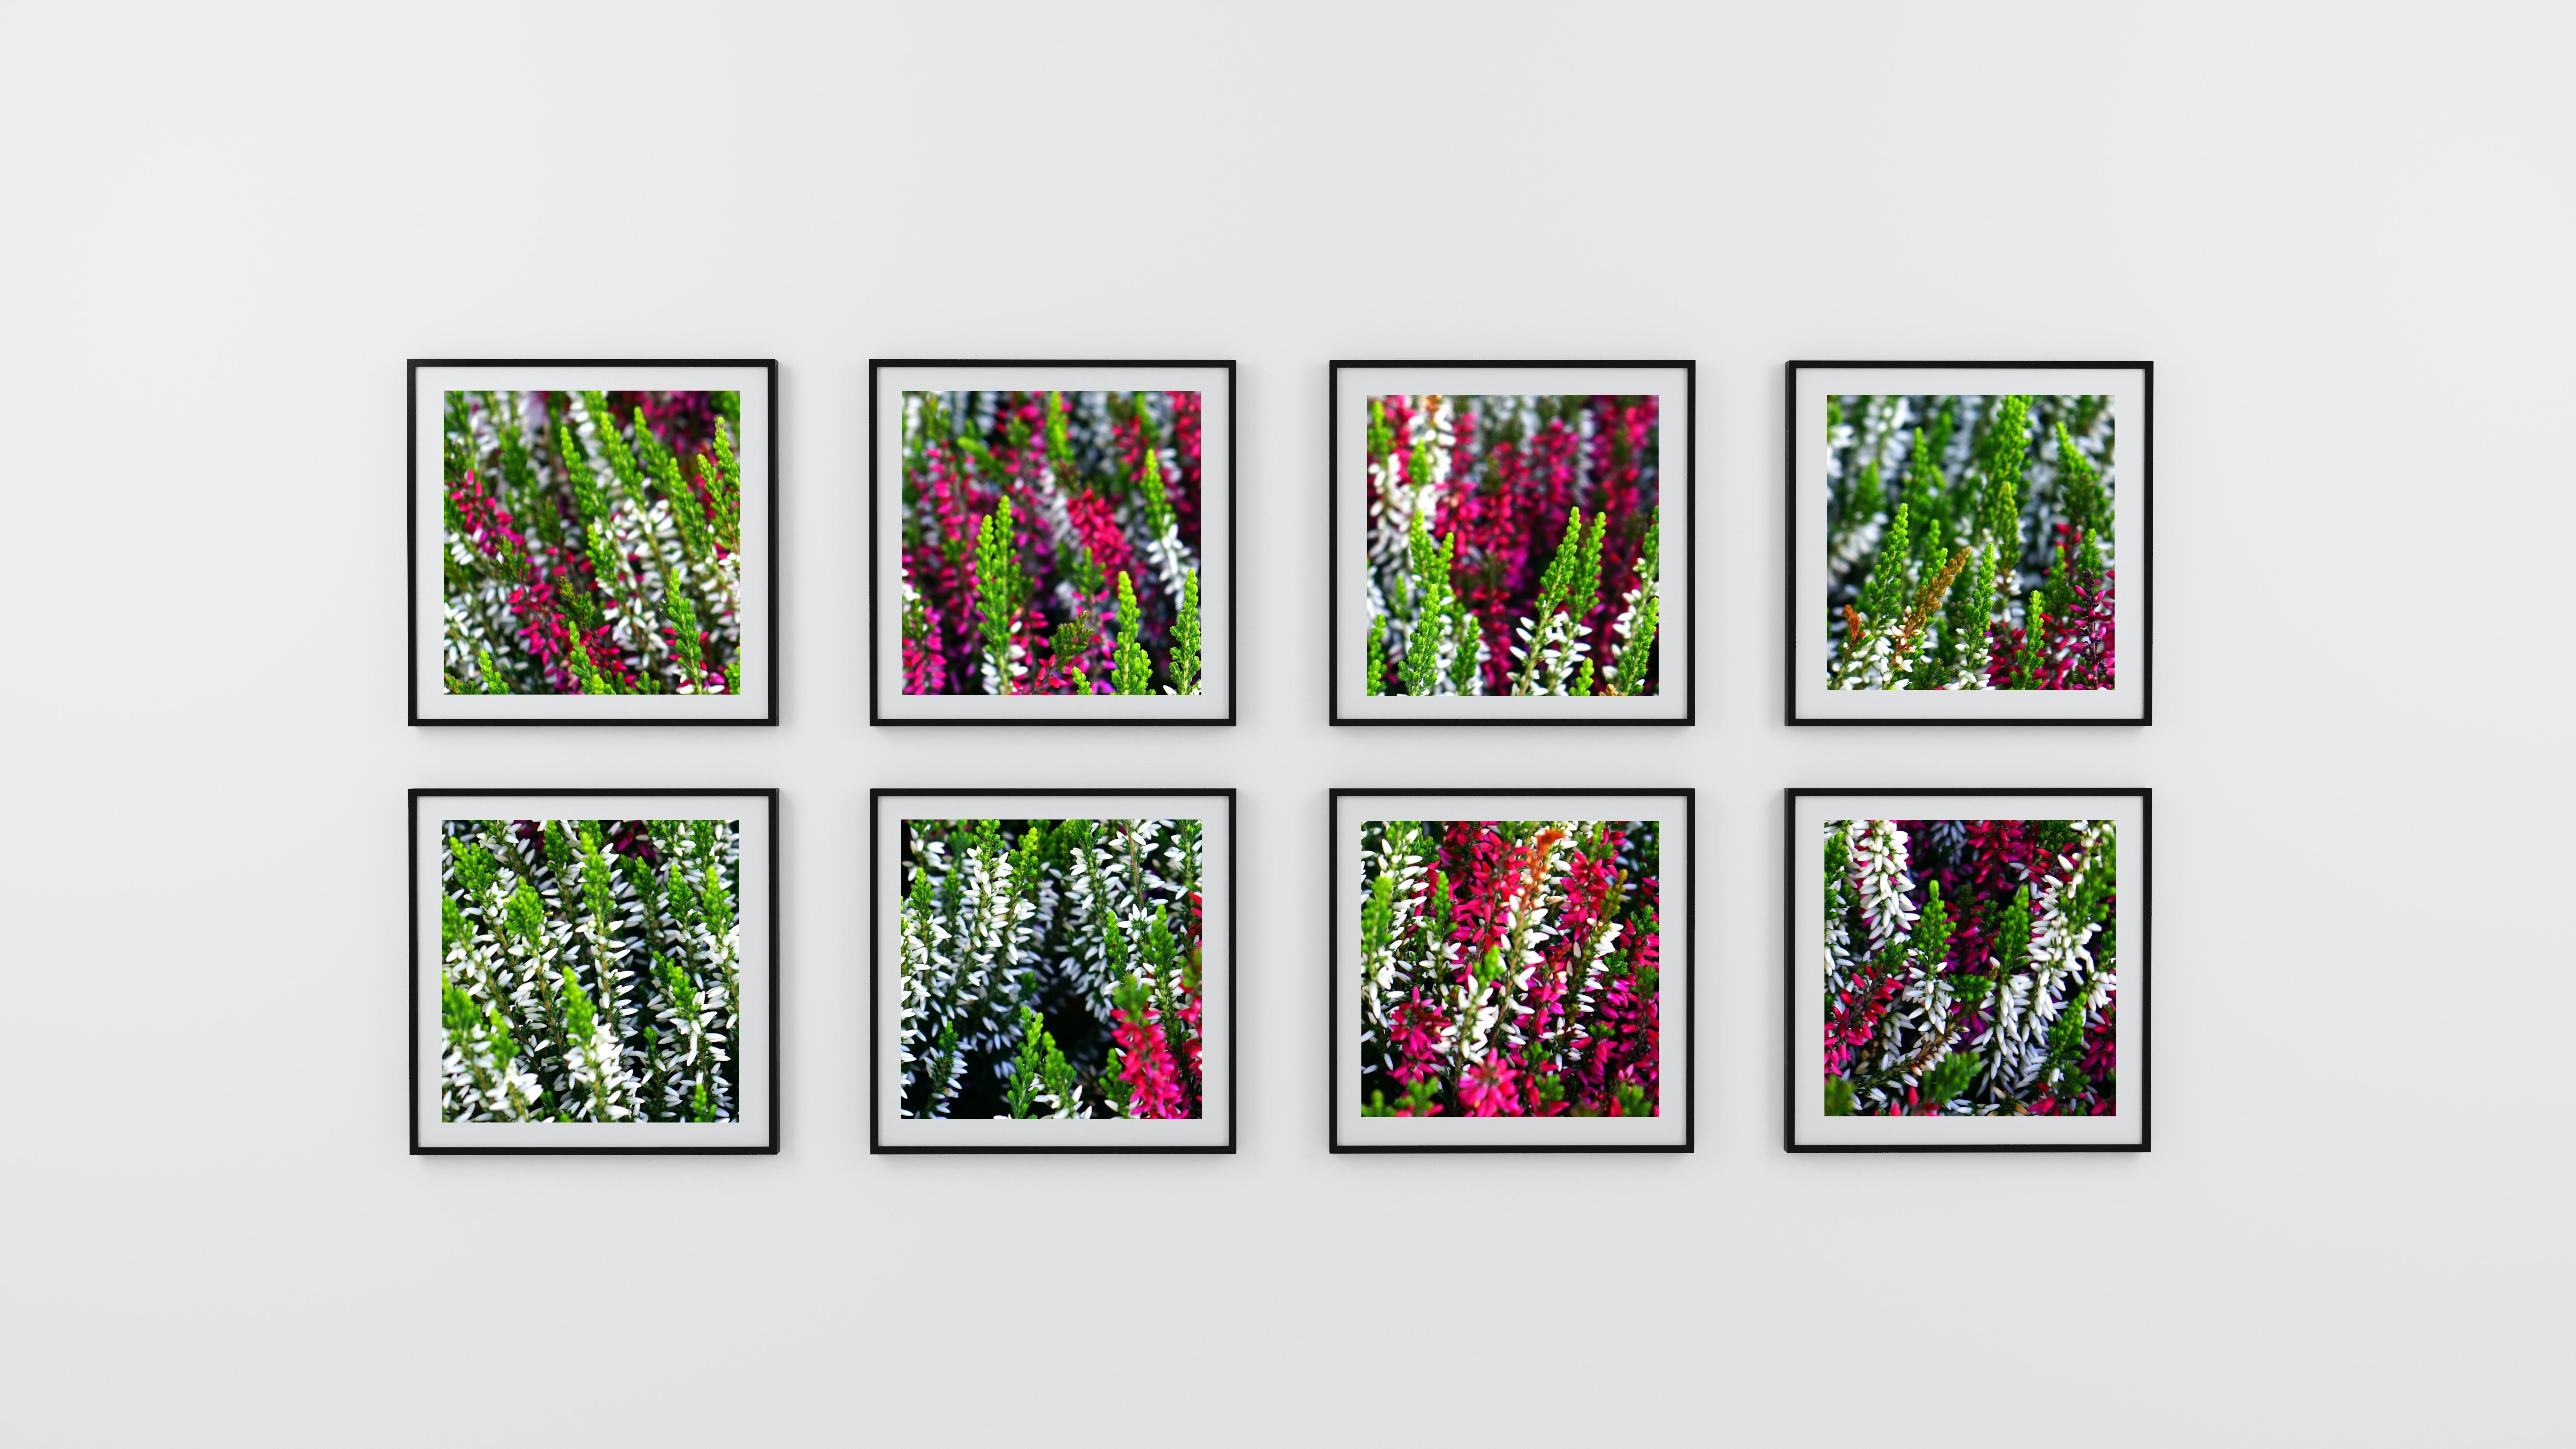 Kostenloses Stock Foto zu abbildung, ausstellungsstück, bilderrahmen, blumen